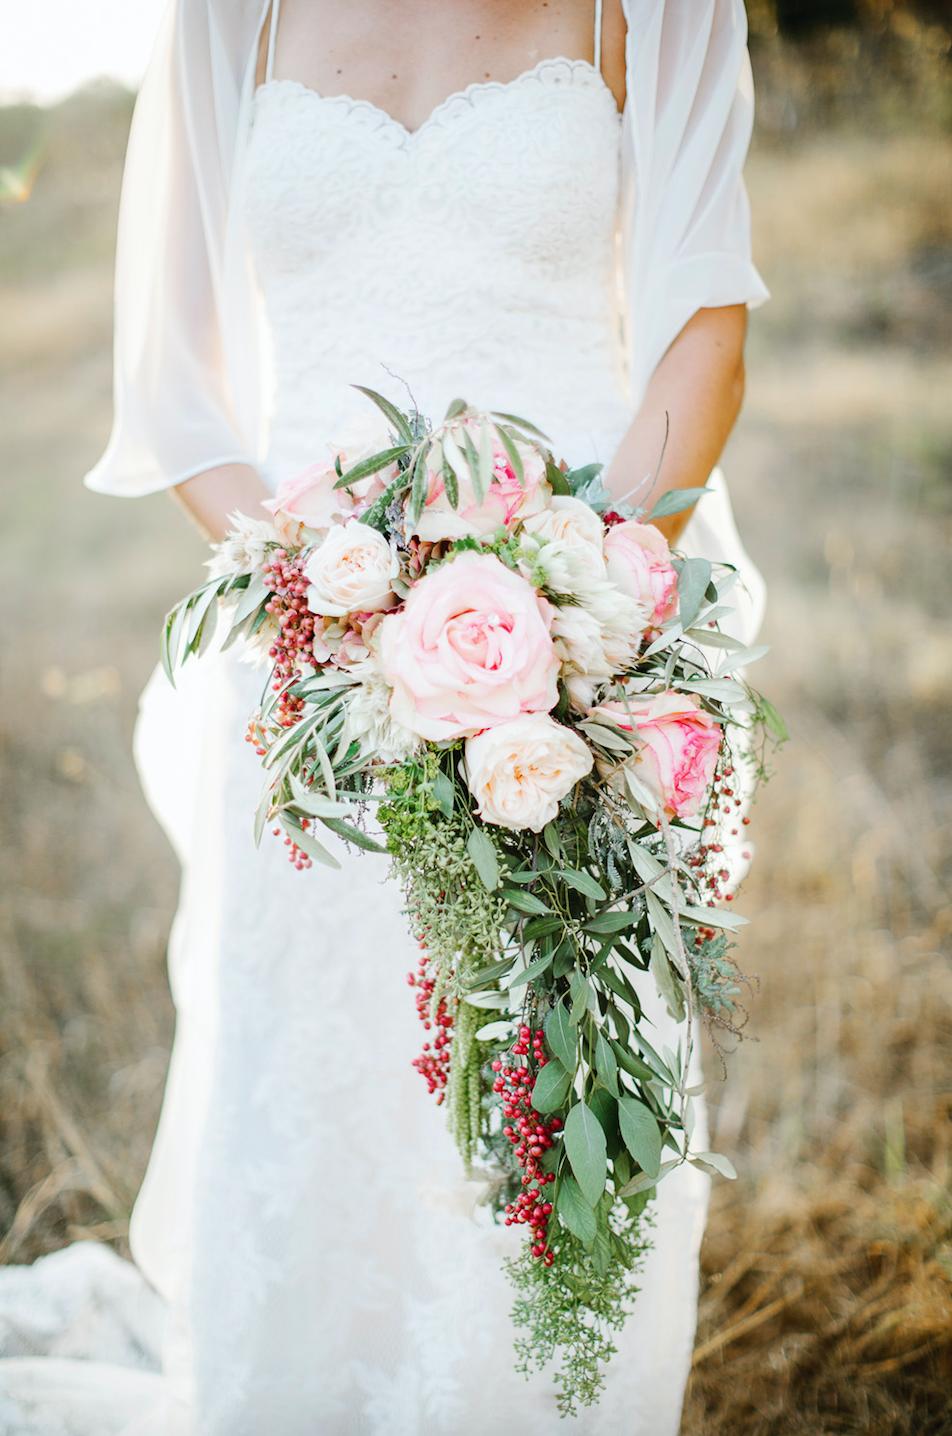 Wild Bouquet, italian wedding bouquet from Italian Wedding Designer